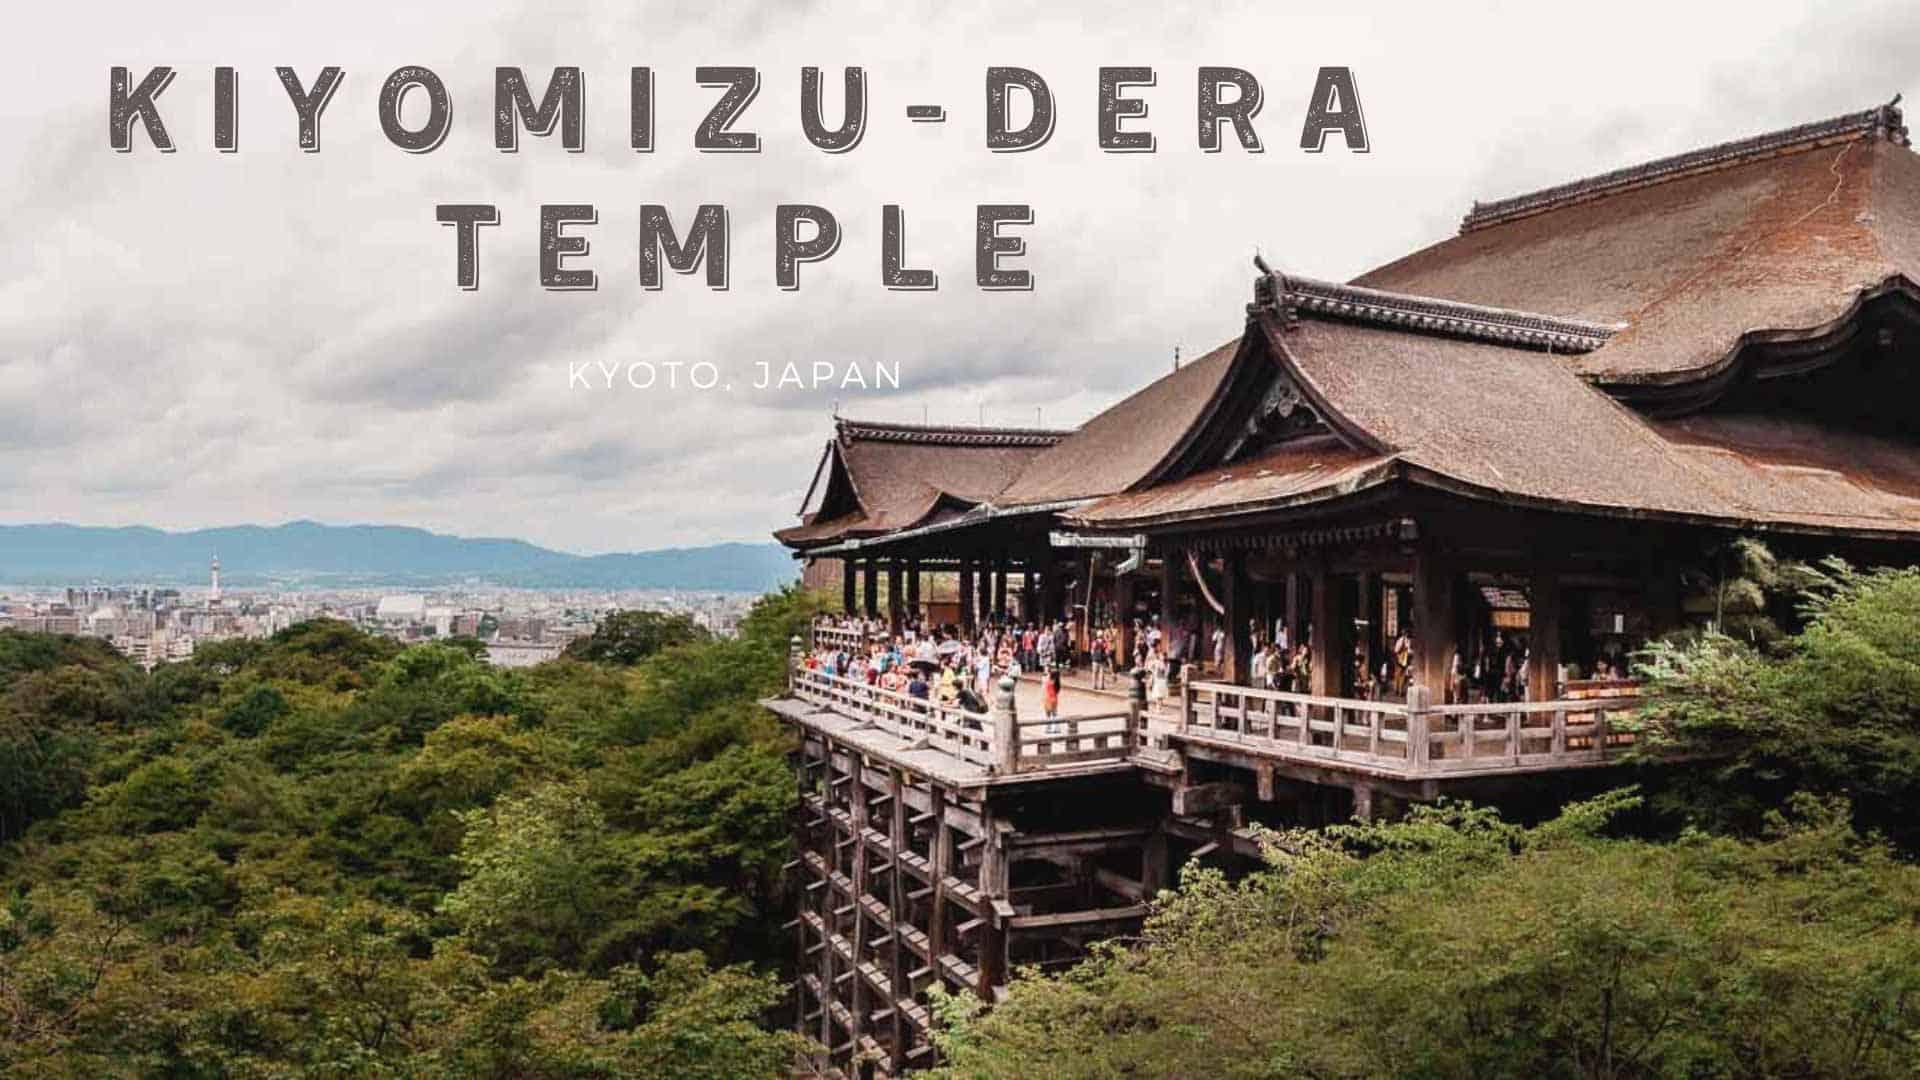 Guide to Kiyomizu-dera Temple in Kyoto